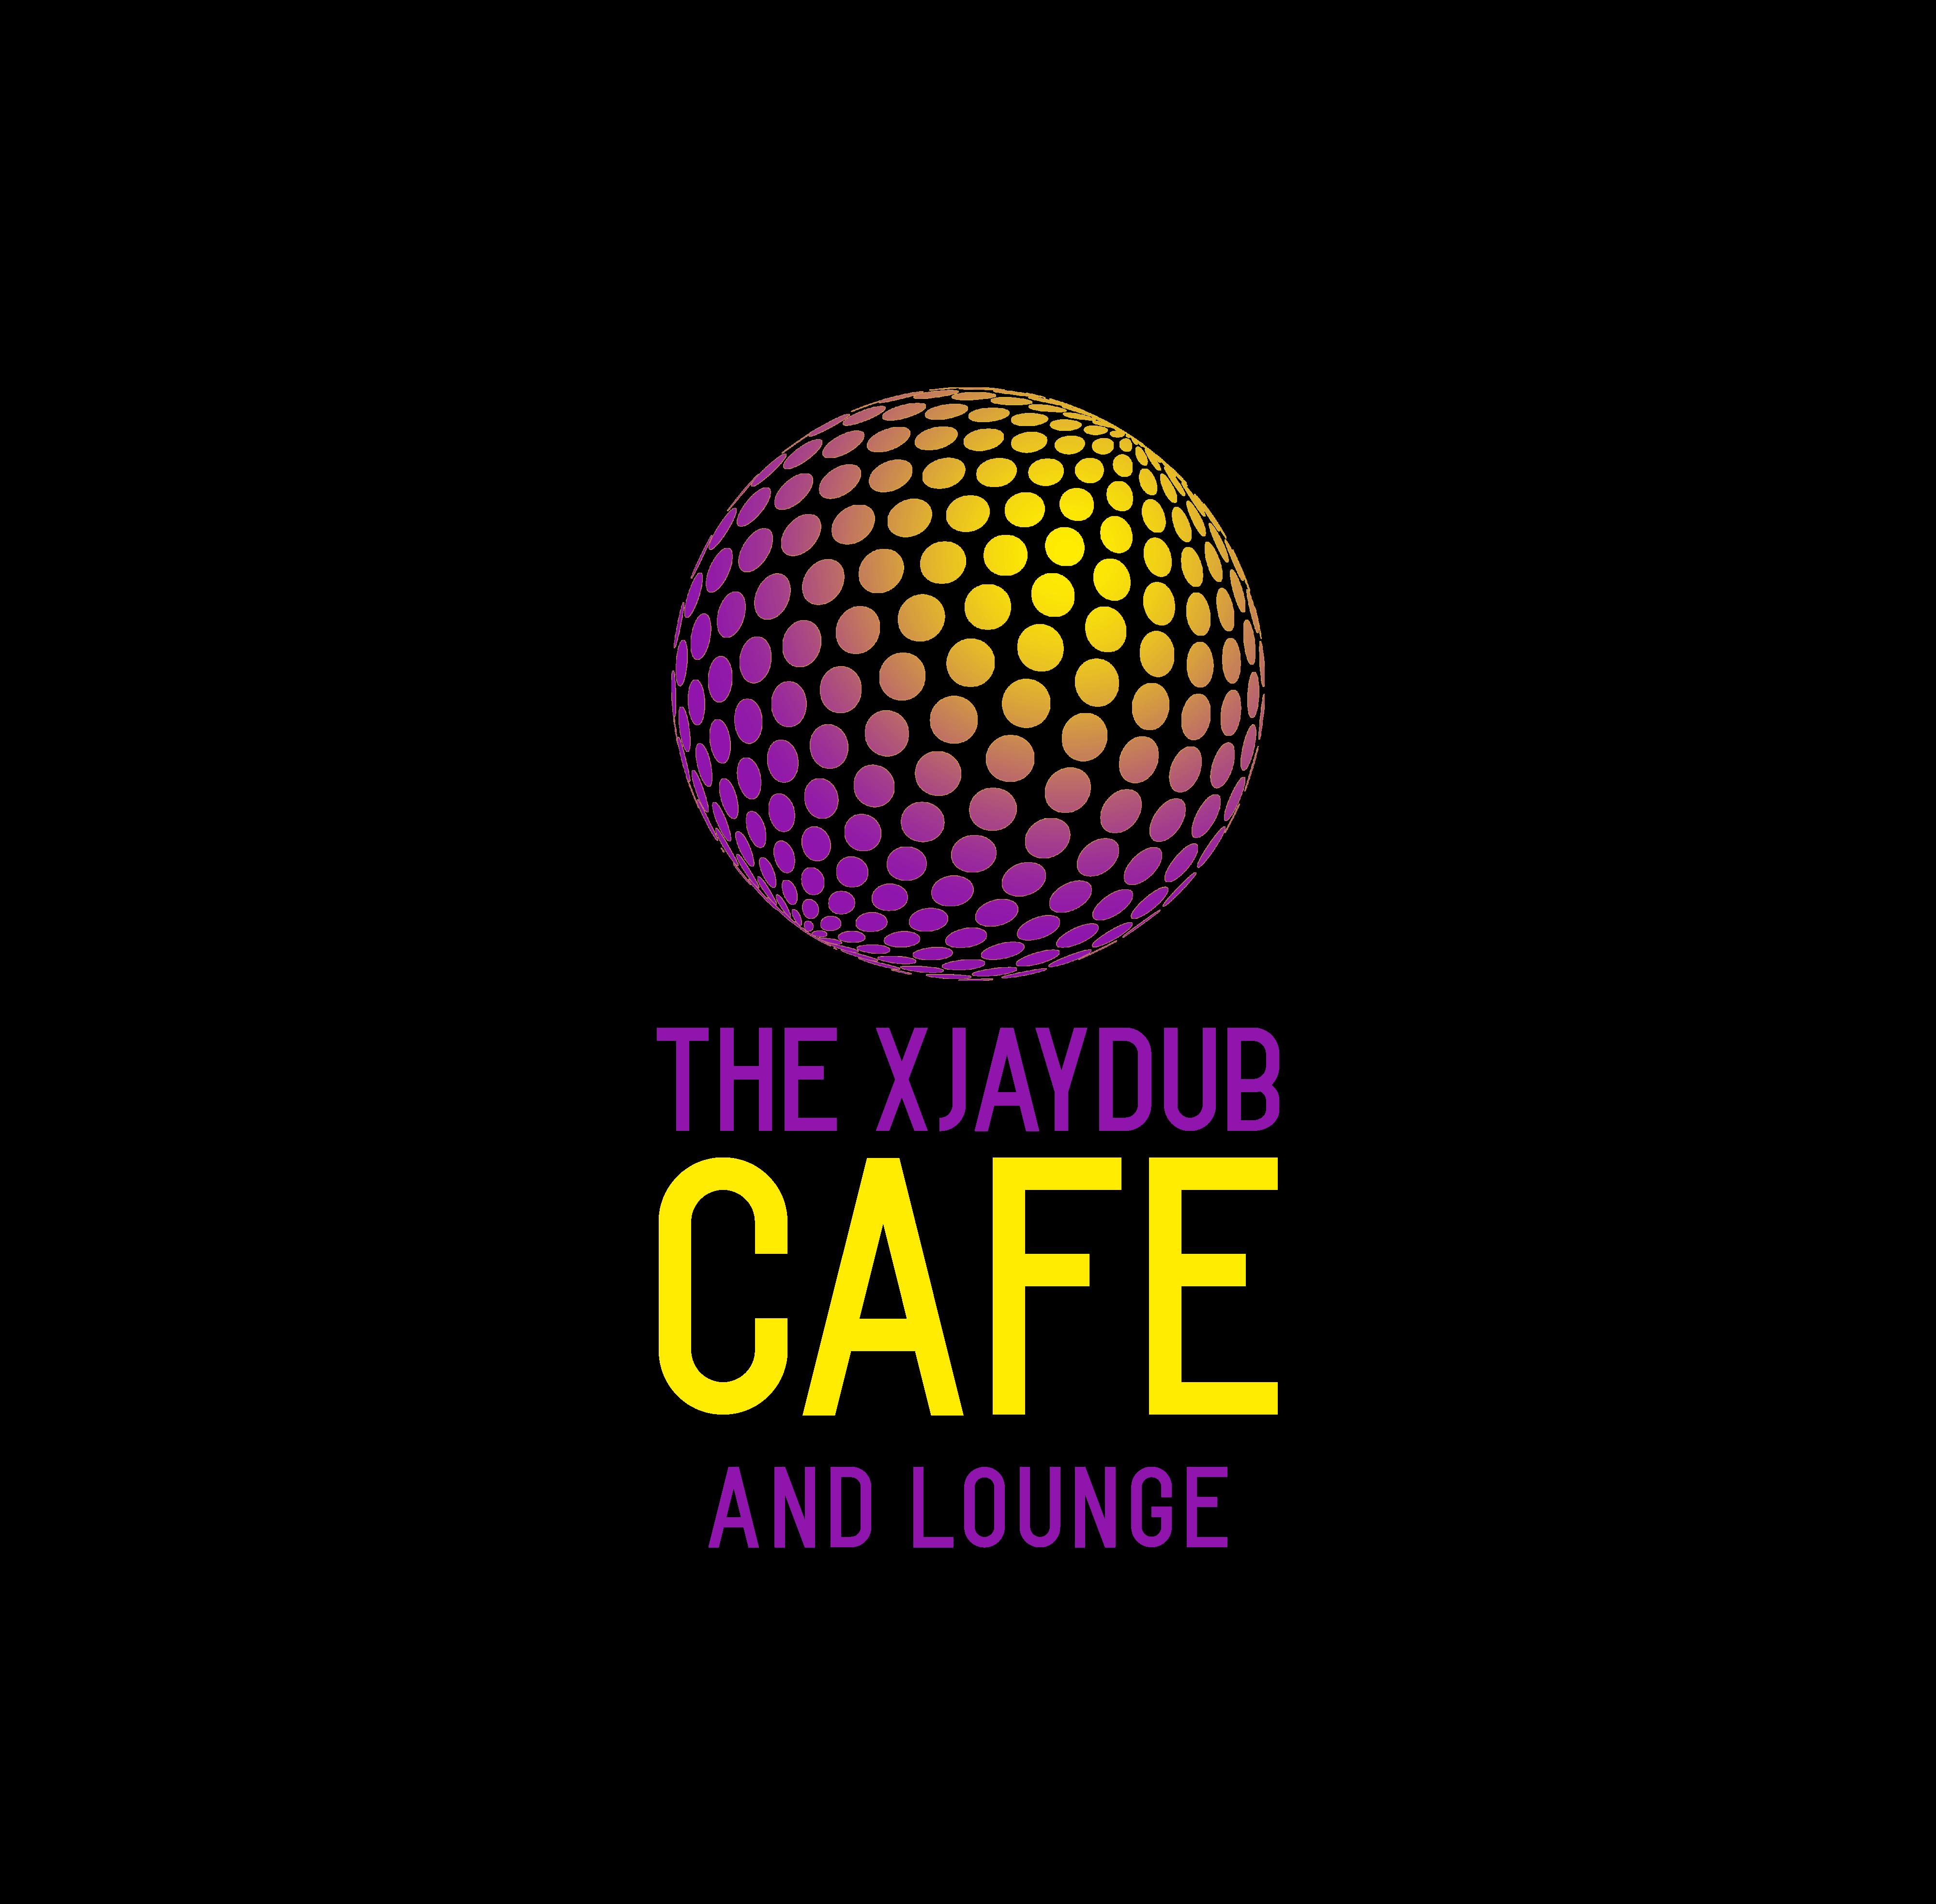 THE XJAYDUB CAFE